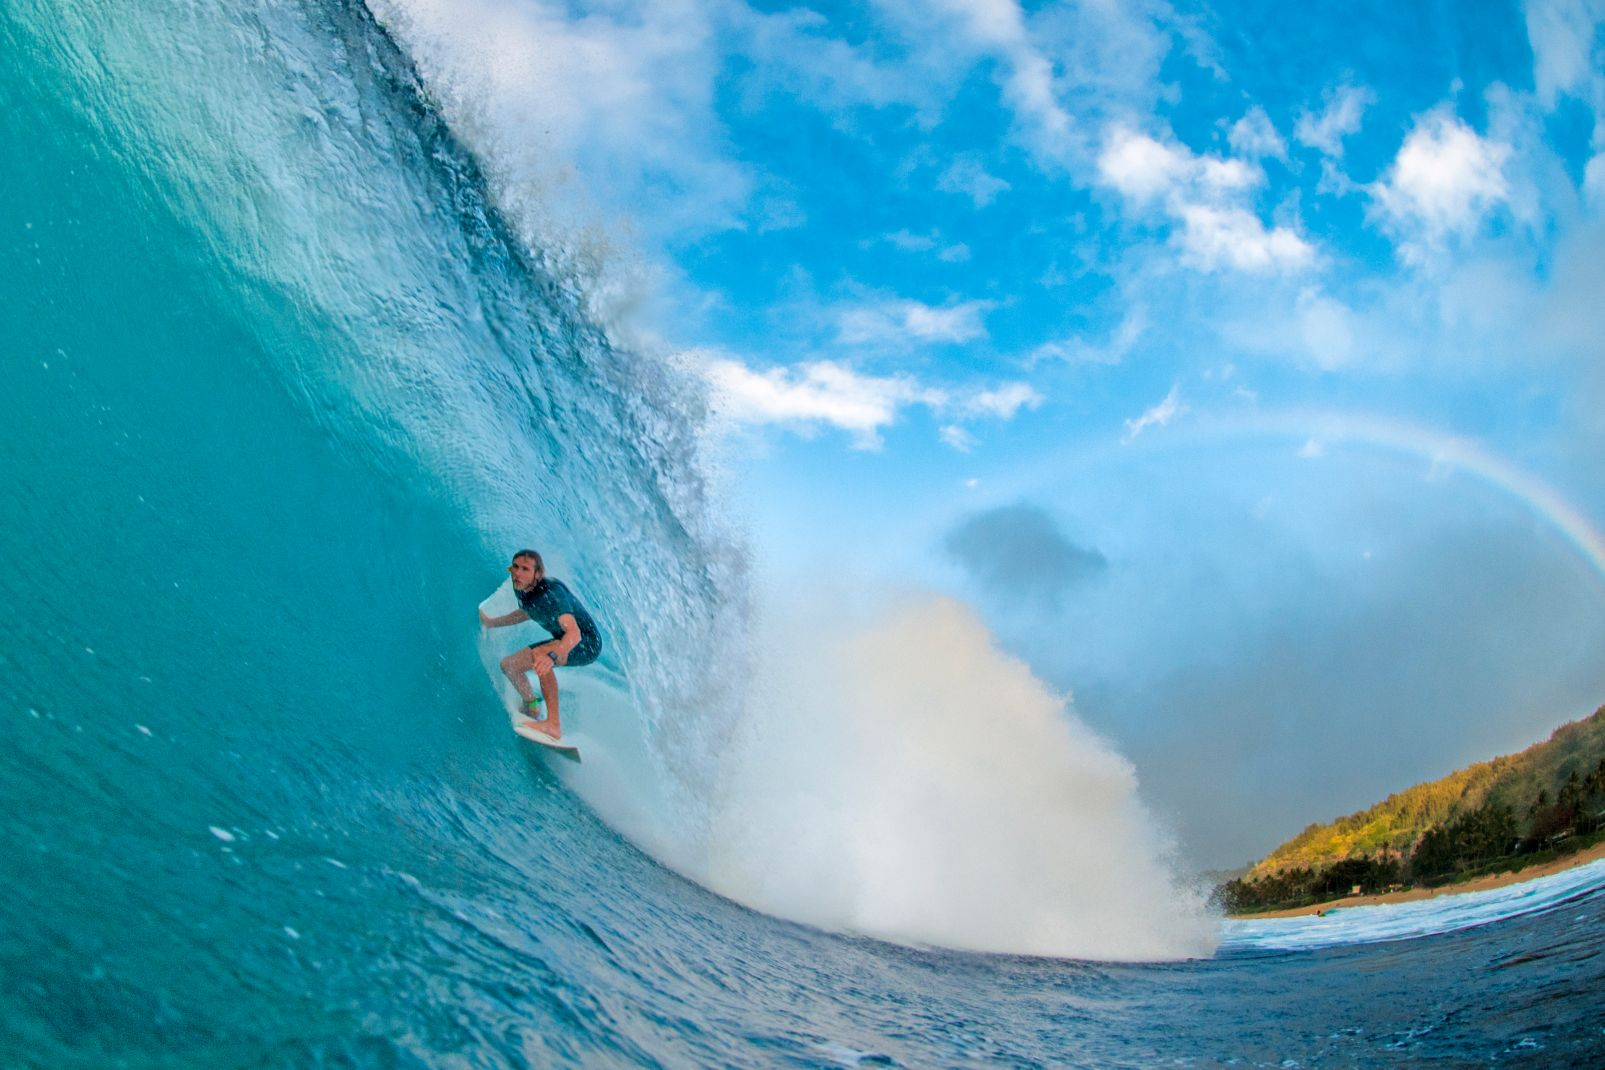 Amérique, USA, Etats-Unis, Hawaï, Hawaii, Oahu, surf, surfeuse, mer, bain, océan, sport, glisse